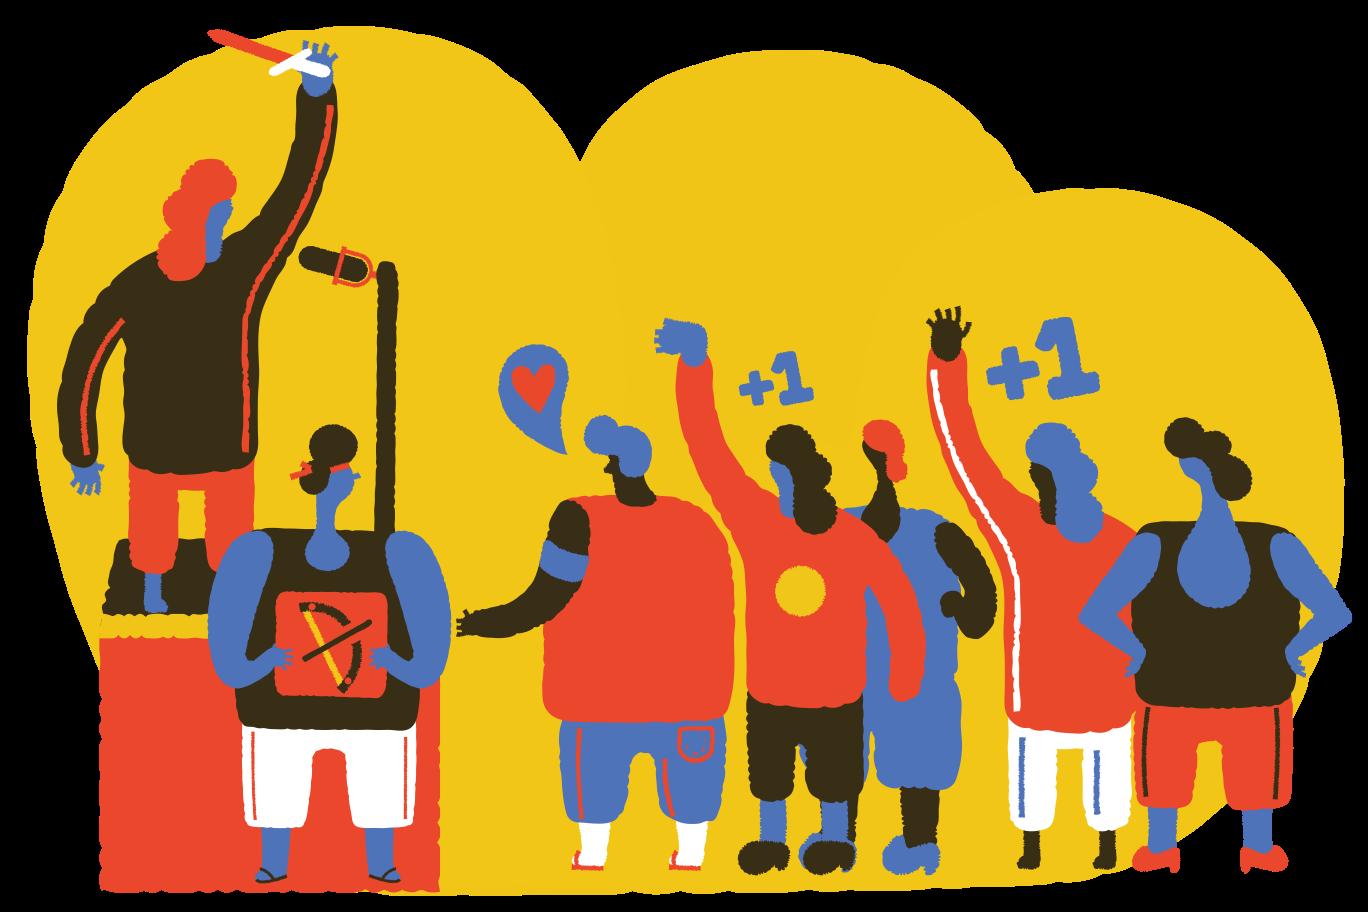 Protests Clipart illustration in PNG, SVG